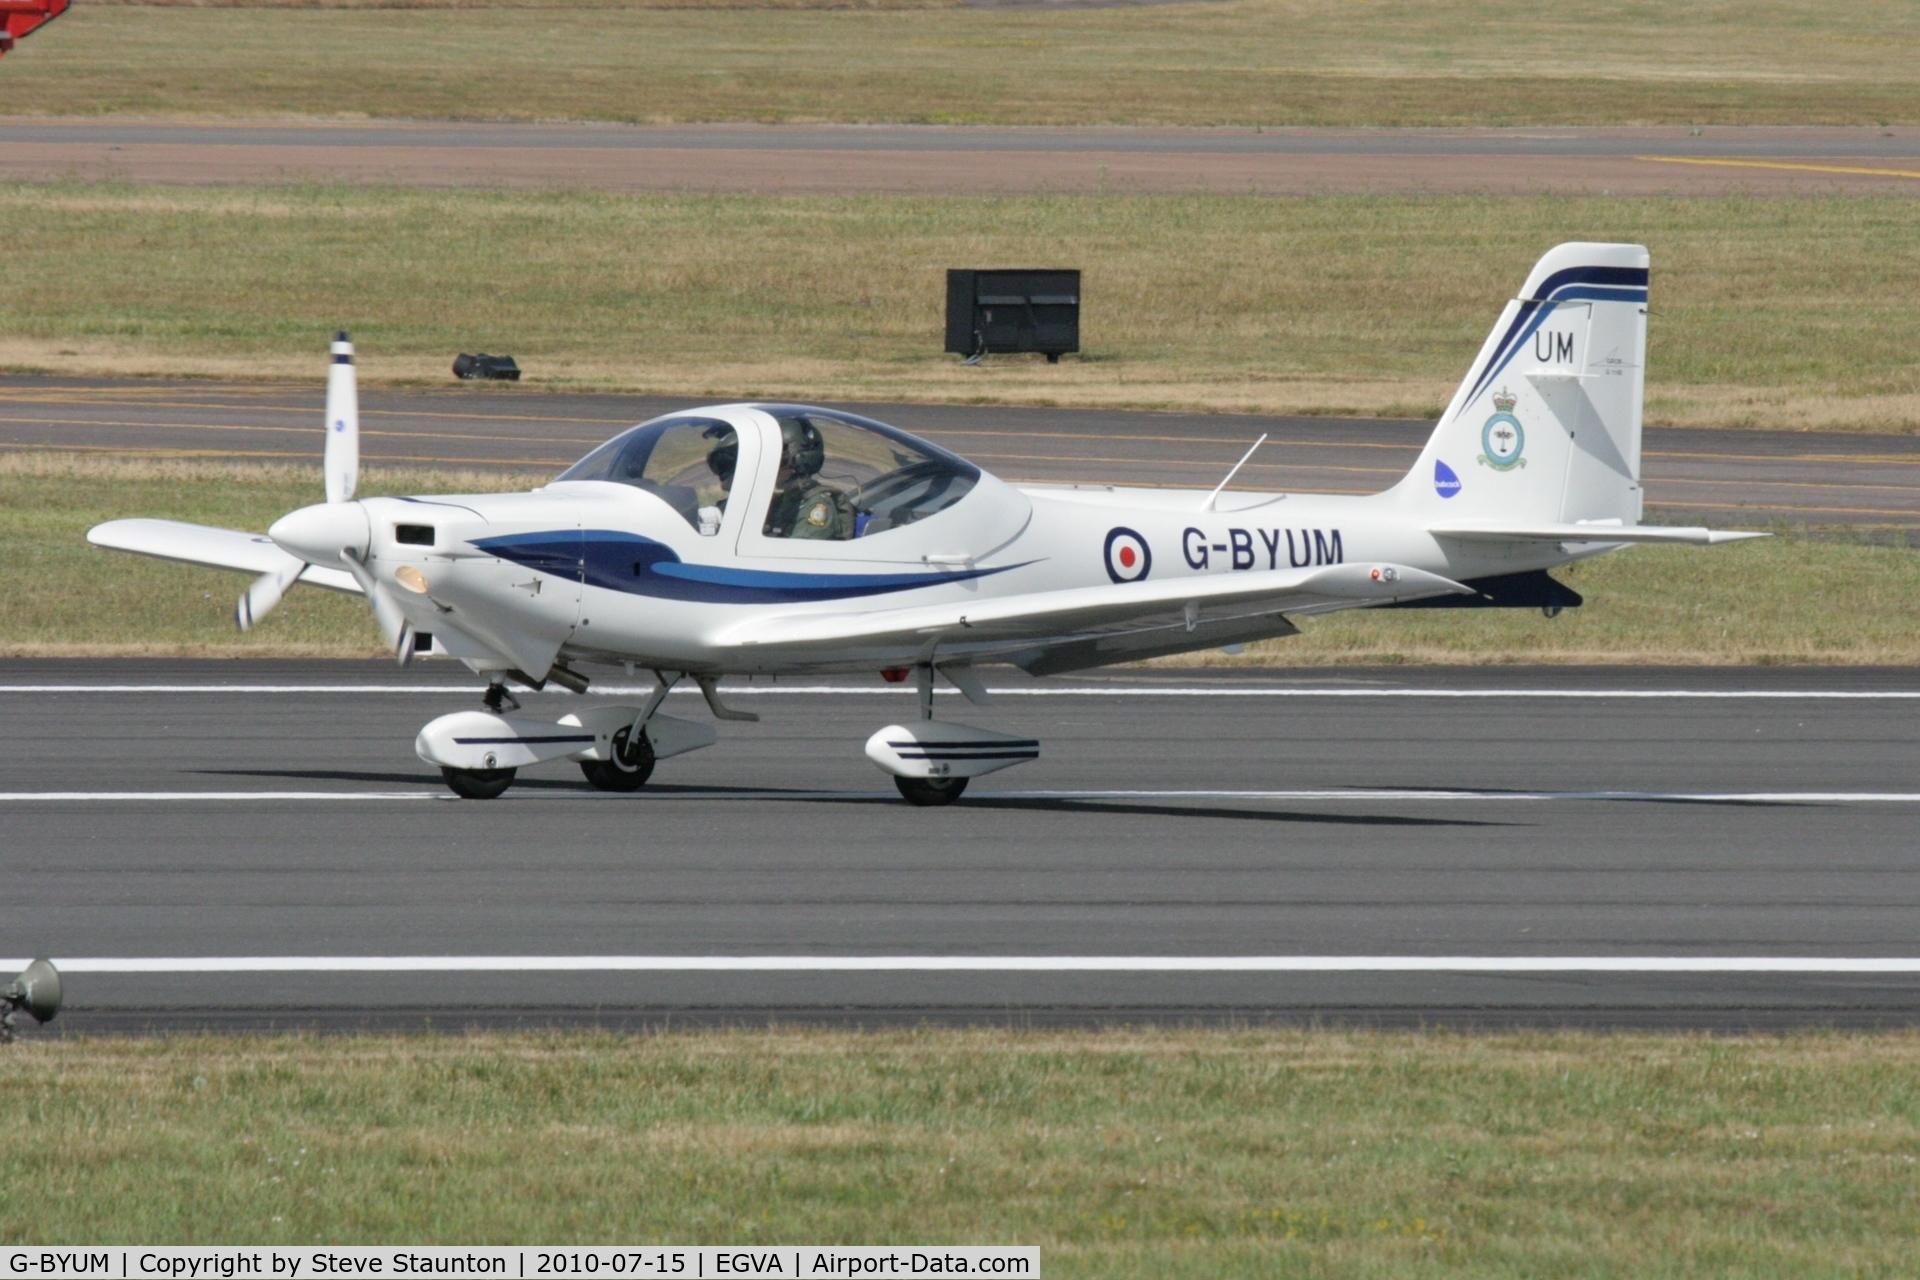 G-BYUM, 1999 Grob G-115E Tutor T1 C/N 82098/E, Taken at the Royal International Air Tattoo 2010